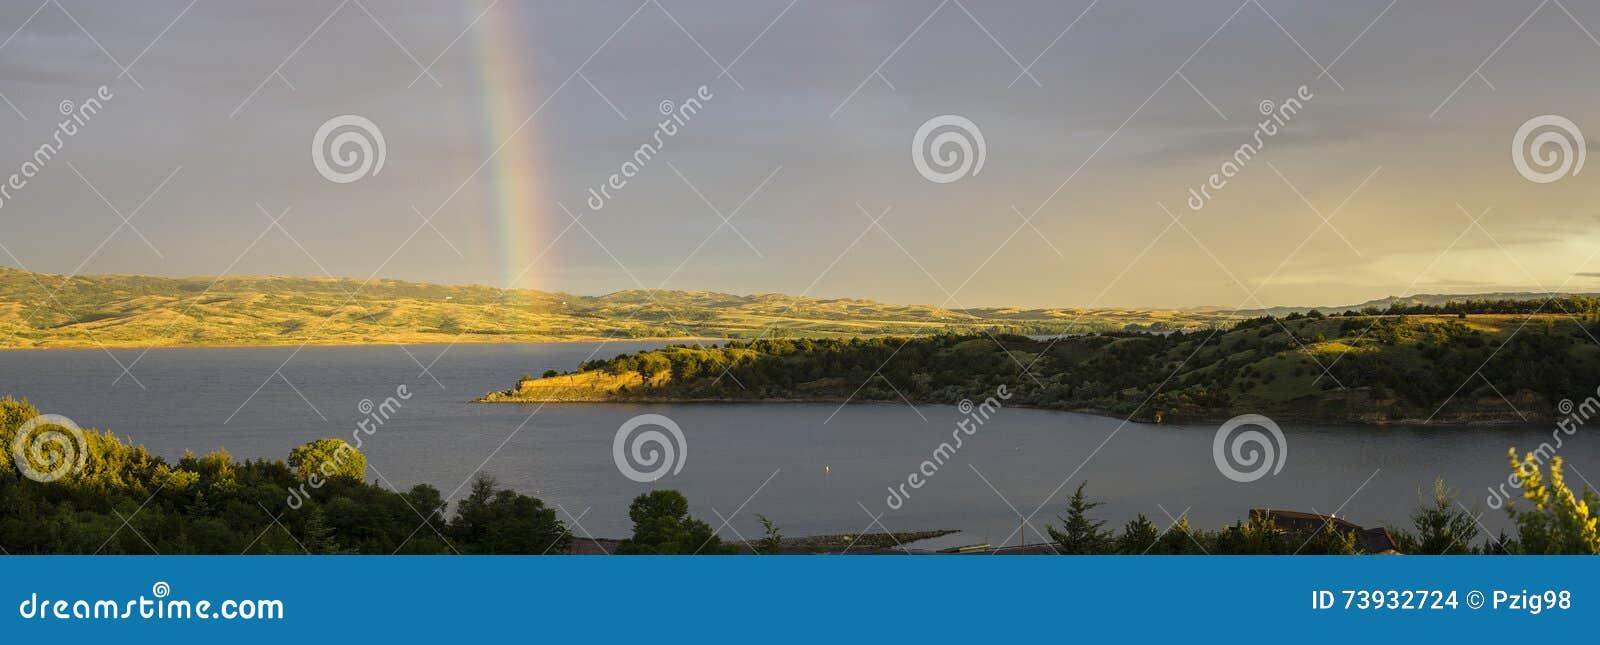 Arco iris del río Missouri, lago Francis Case